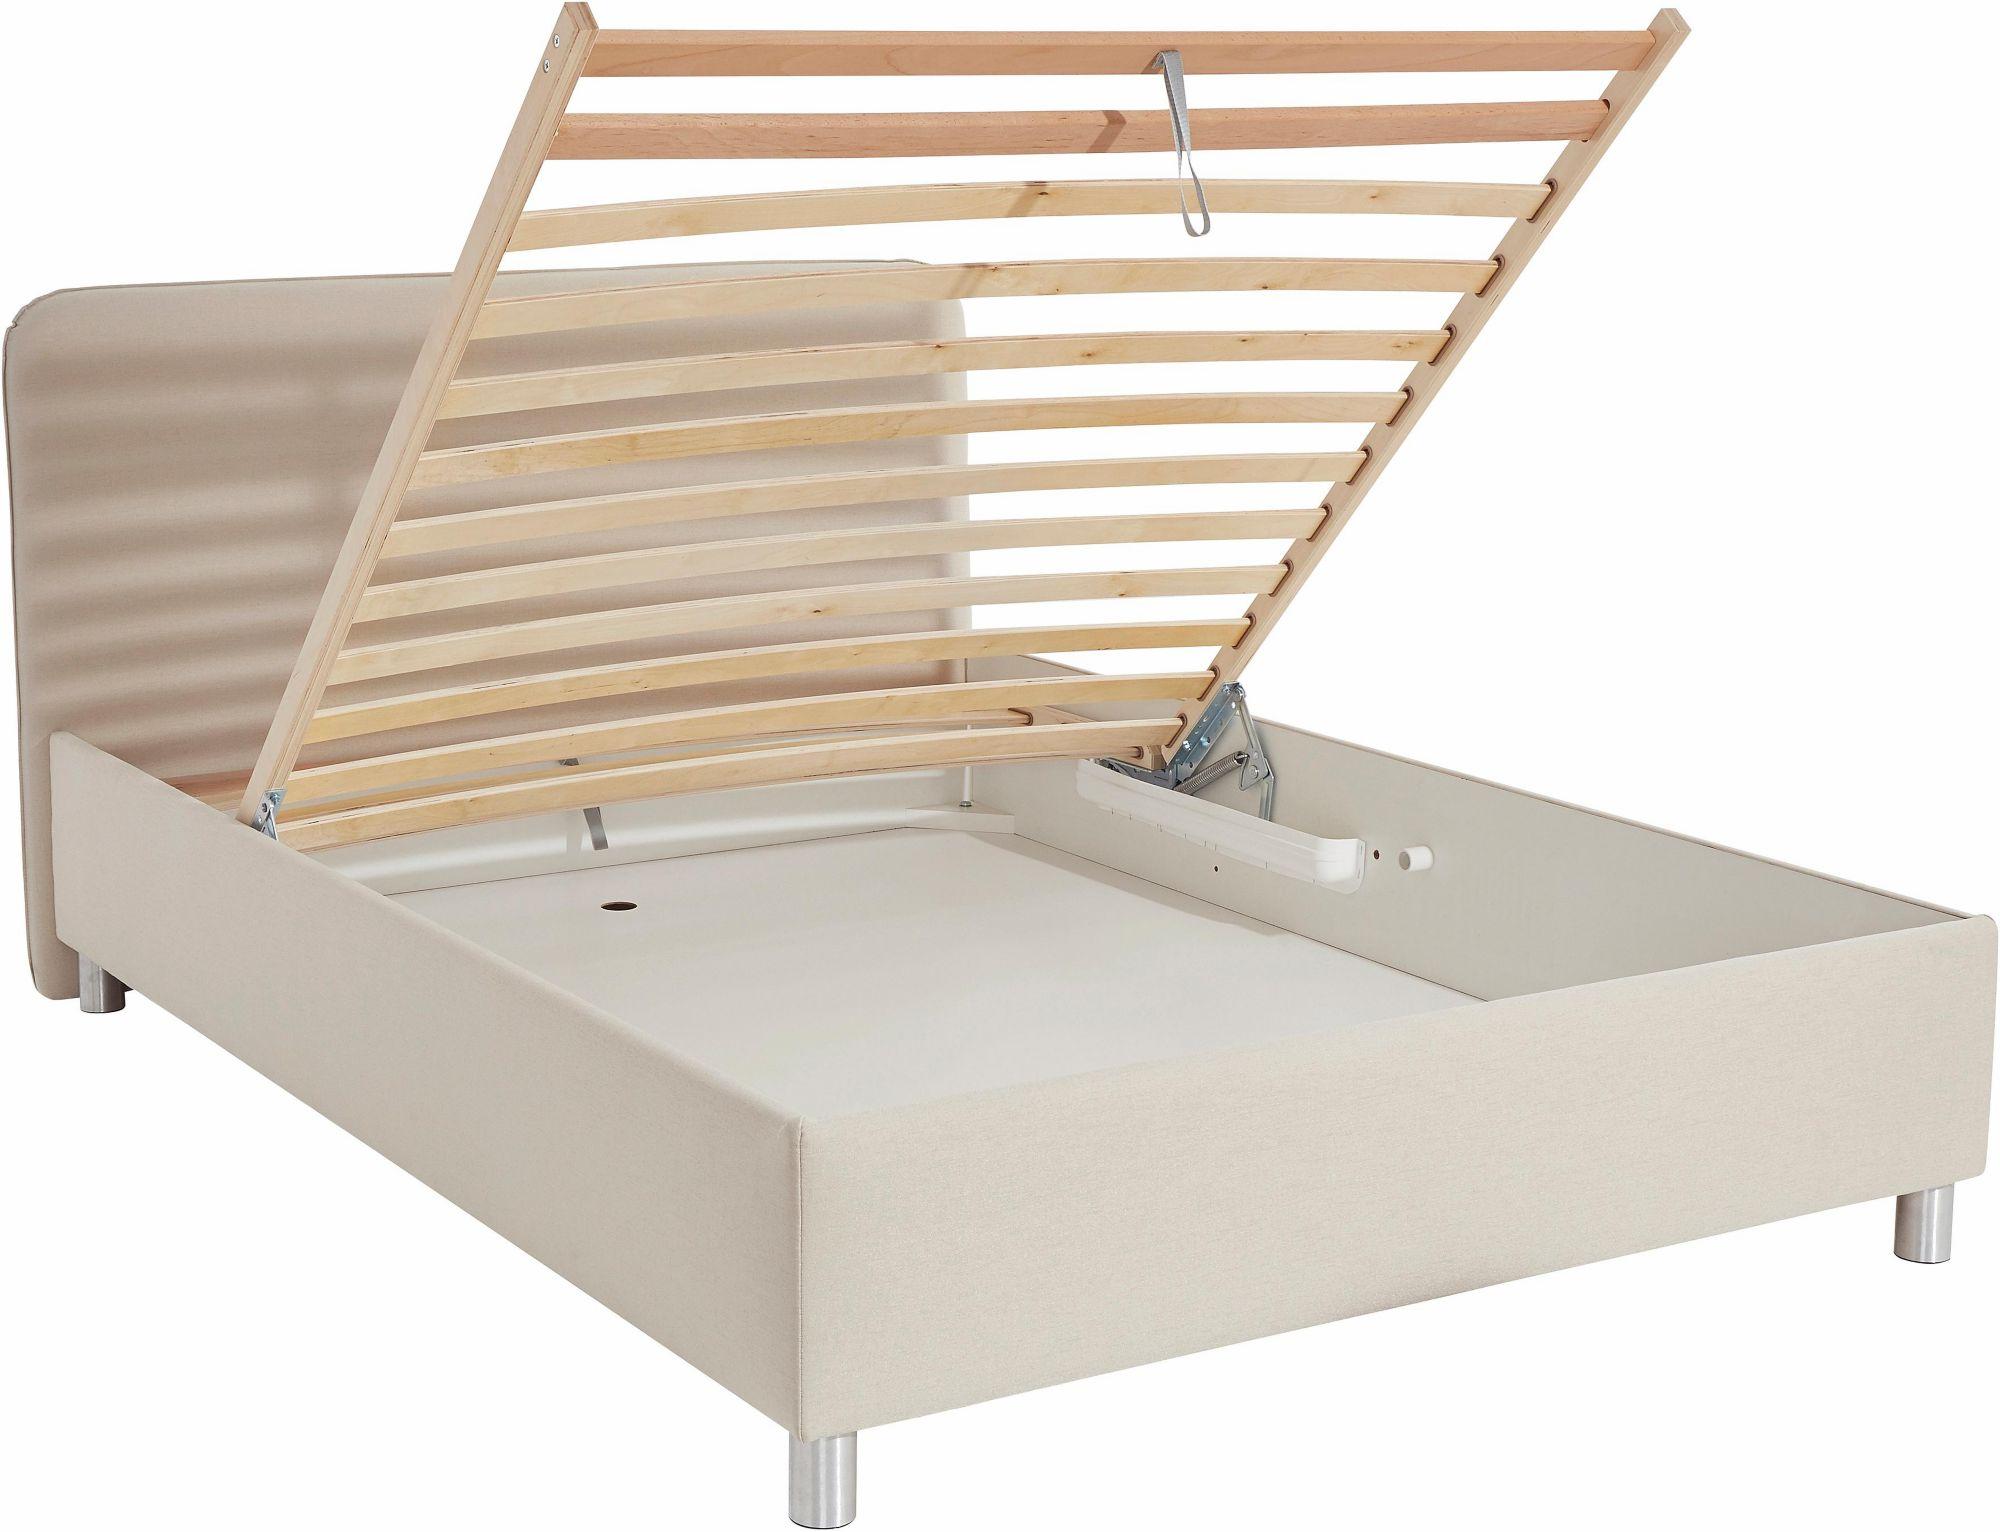 bonnell federkernmatratze h2 bonnell federkernmatratze atlantic home collection boxspringbett. Black Bedroom Furniture Sets. Home Design Ideas